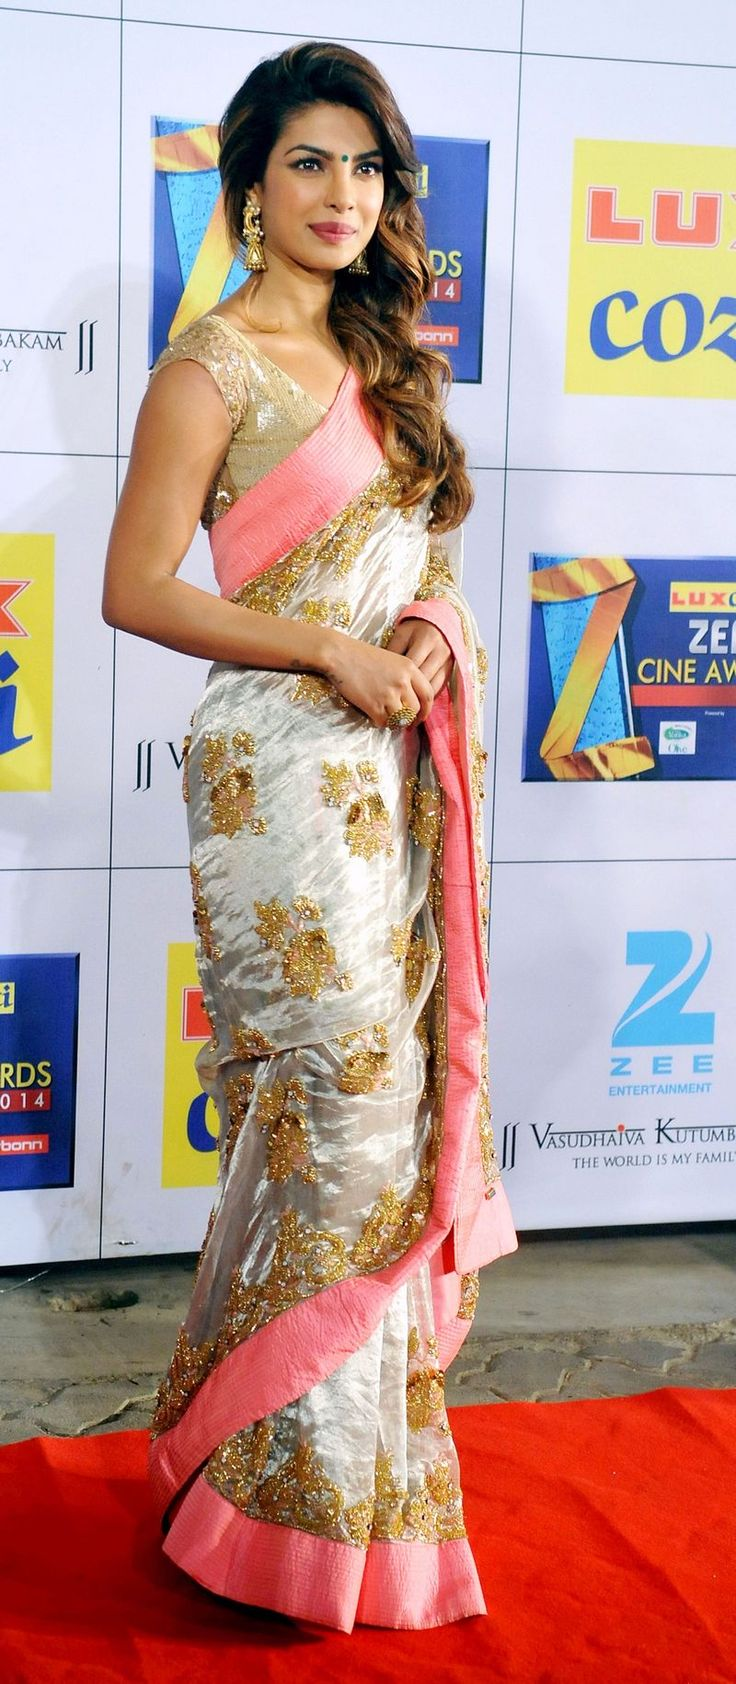 Priyanka Chopra on the red carpet at the Zee Cine Awards 2014. #Style #Bollywood #Fashion #Beauty